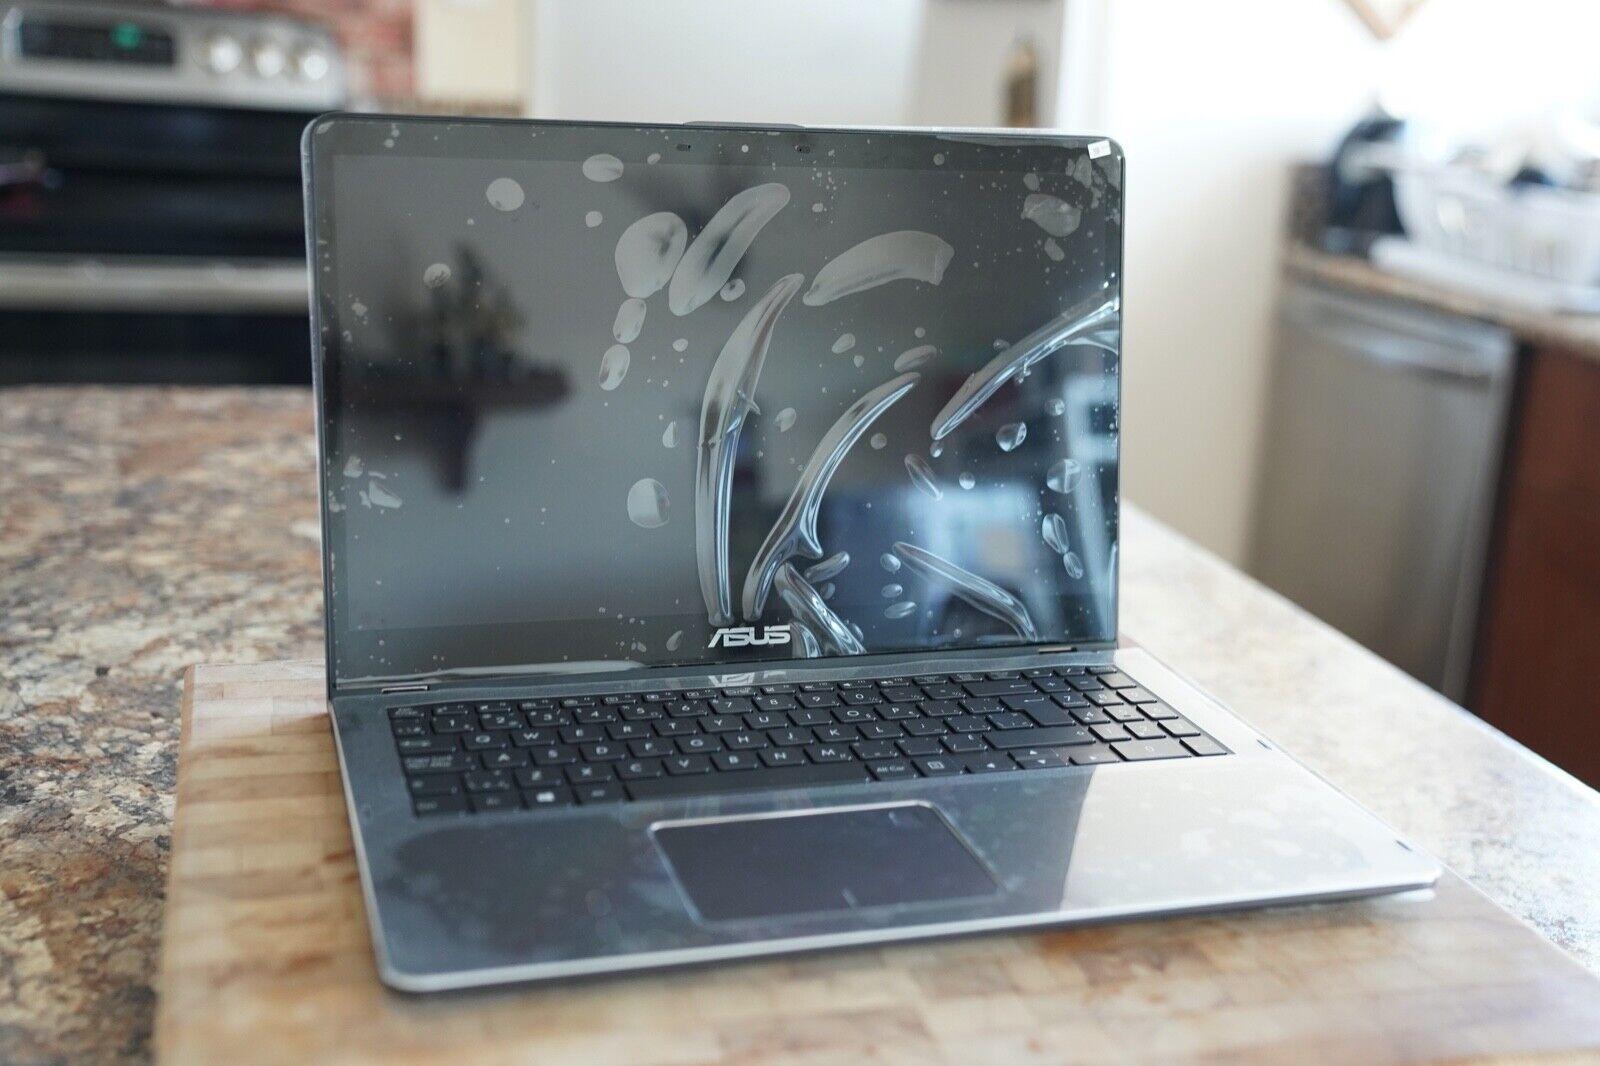 "Asus ZenBook Flip UX561UA 15.6"" Laptop (Intel i5 8250U, 512GB SSD, 8GB RAM)"